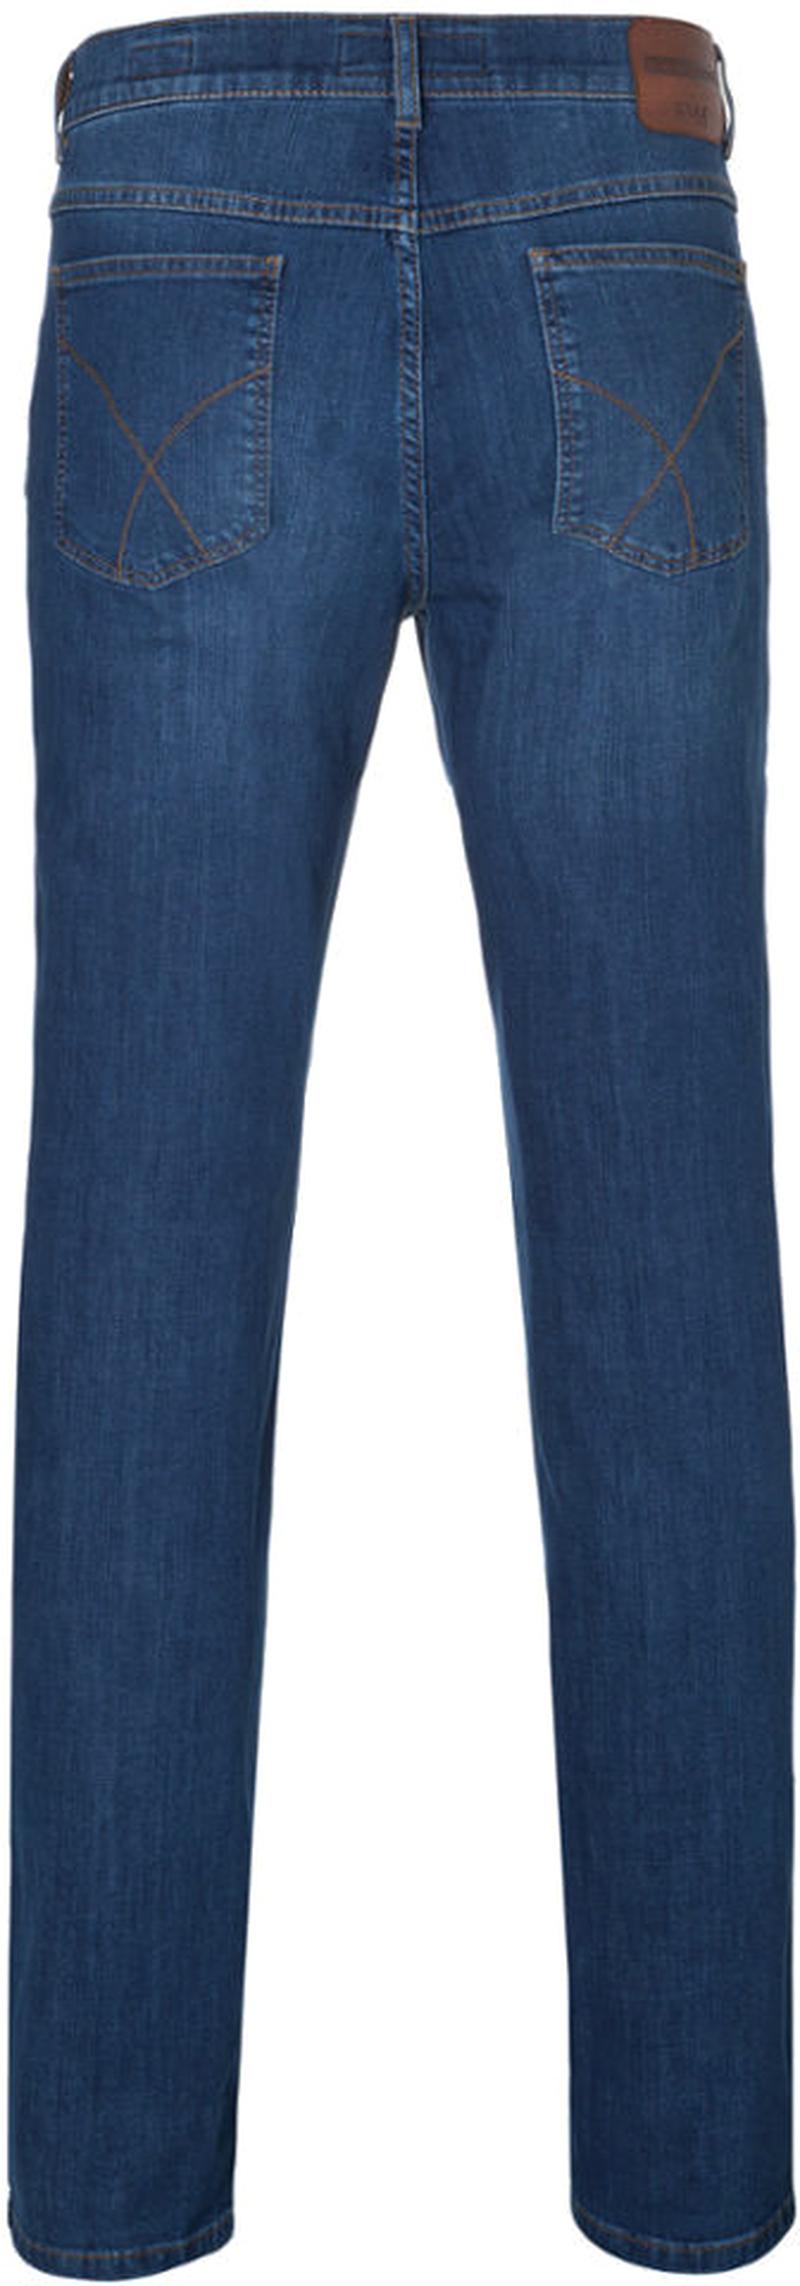 Brax Cooper Denim Jeans Blue Five Pocket foto 1